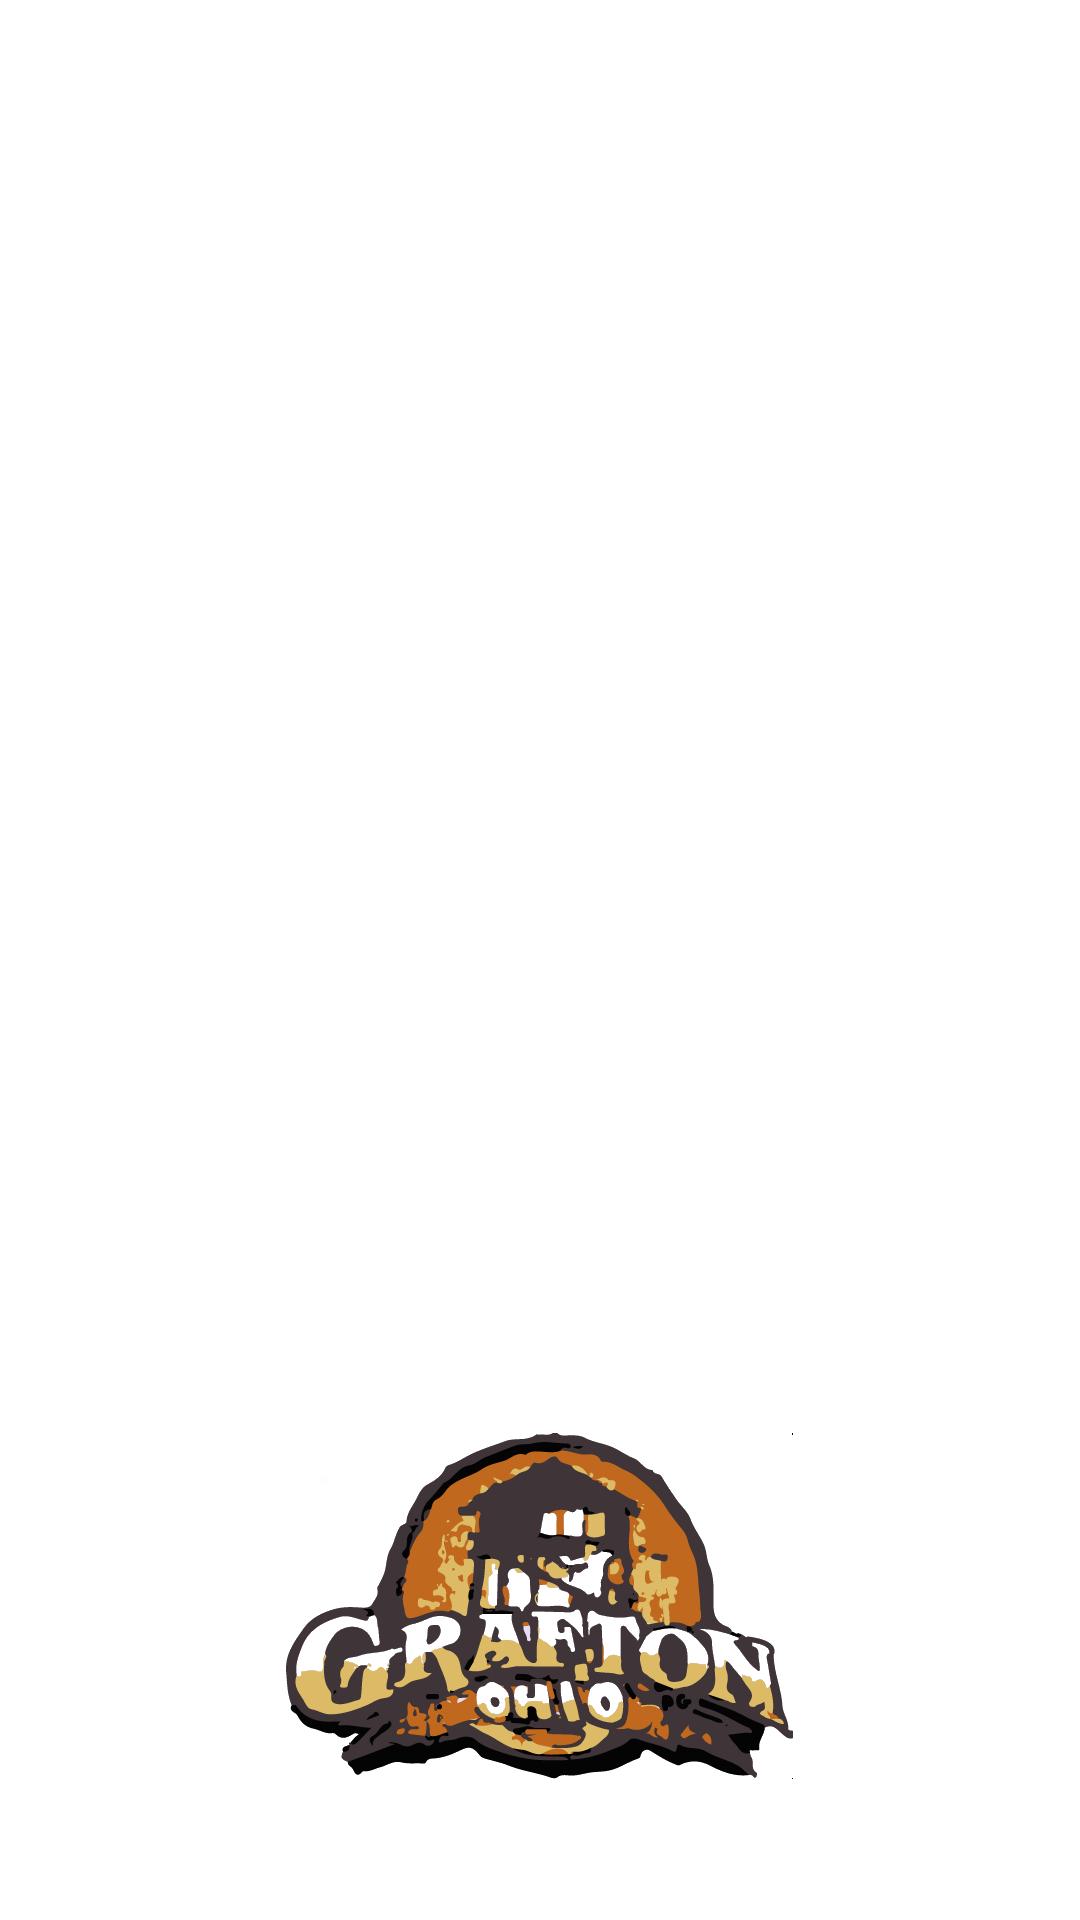 Snapchat Grafton geofilter